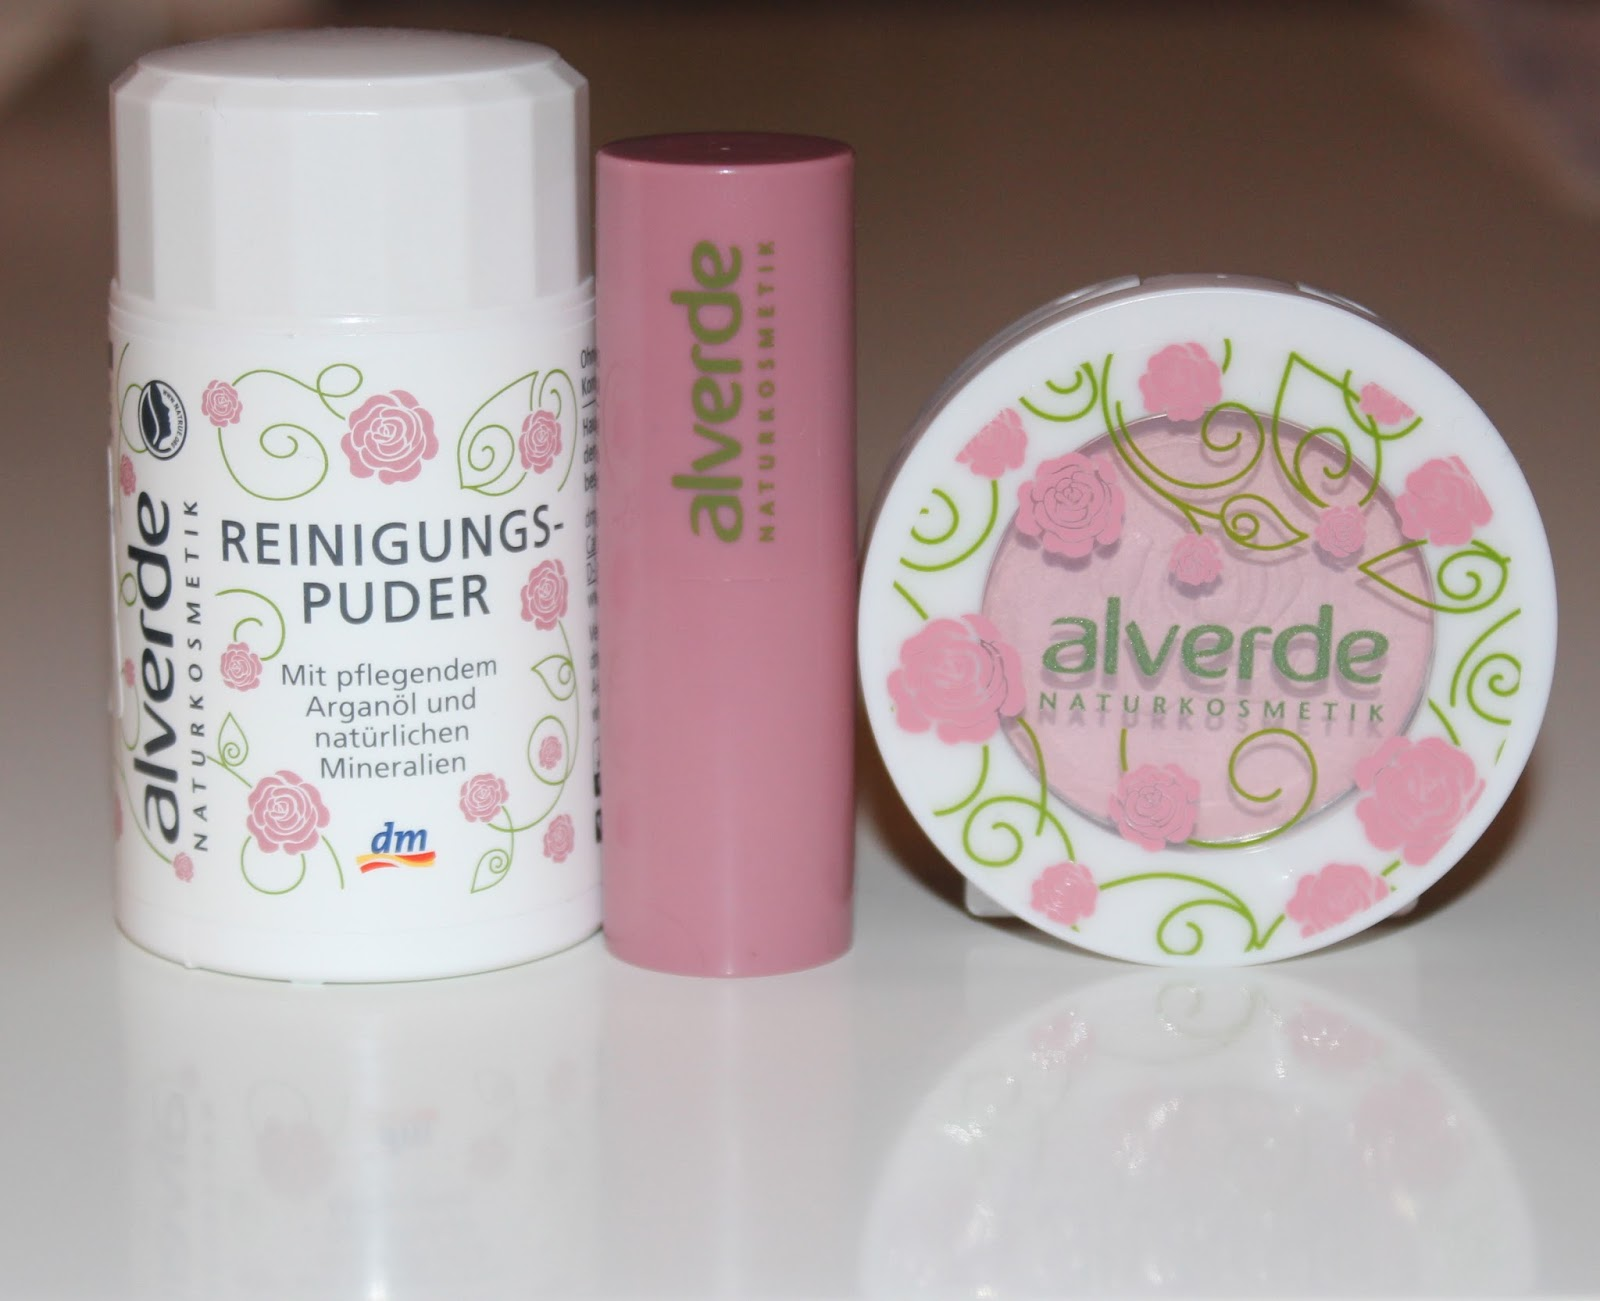 DM #4: Alverde Vintage Rose kolekcija (puder za umivanje, ruž i rumenilo)